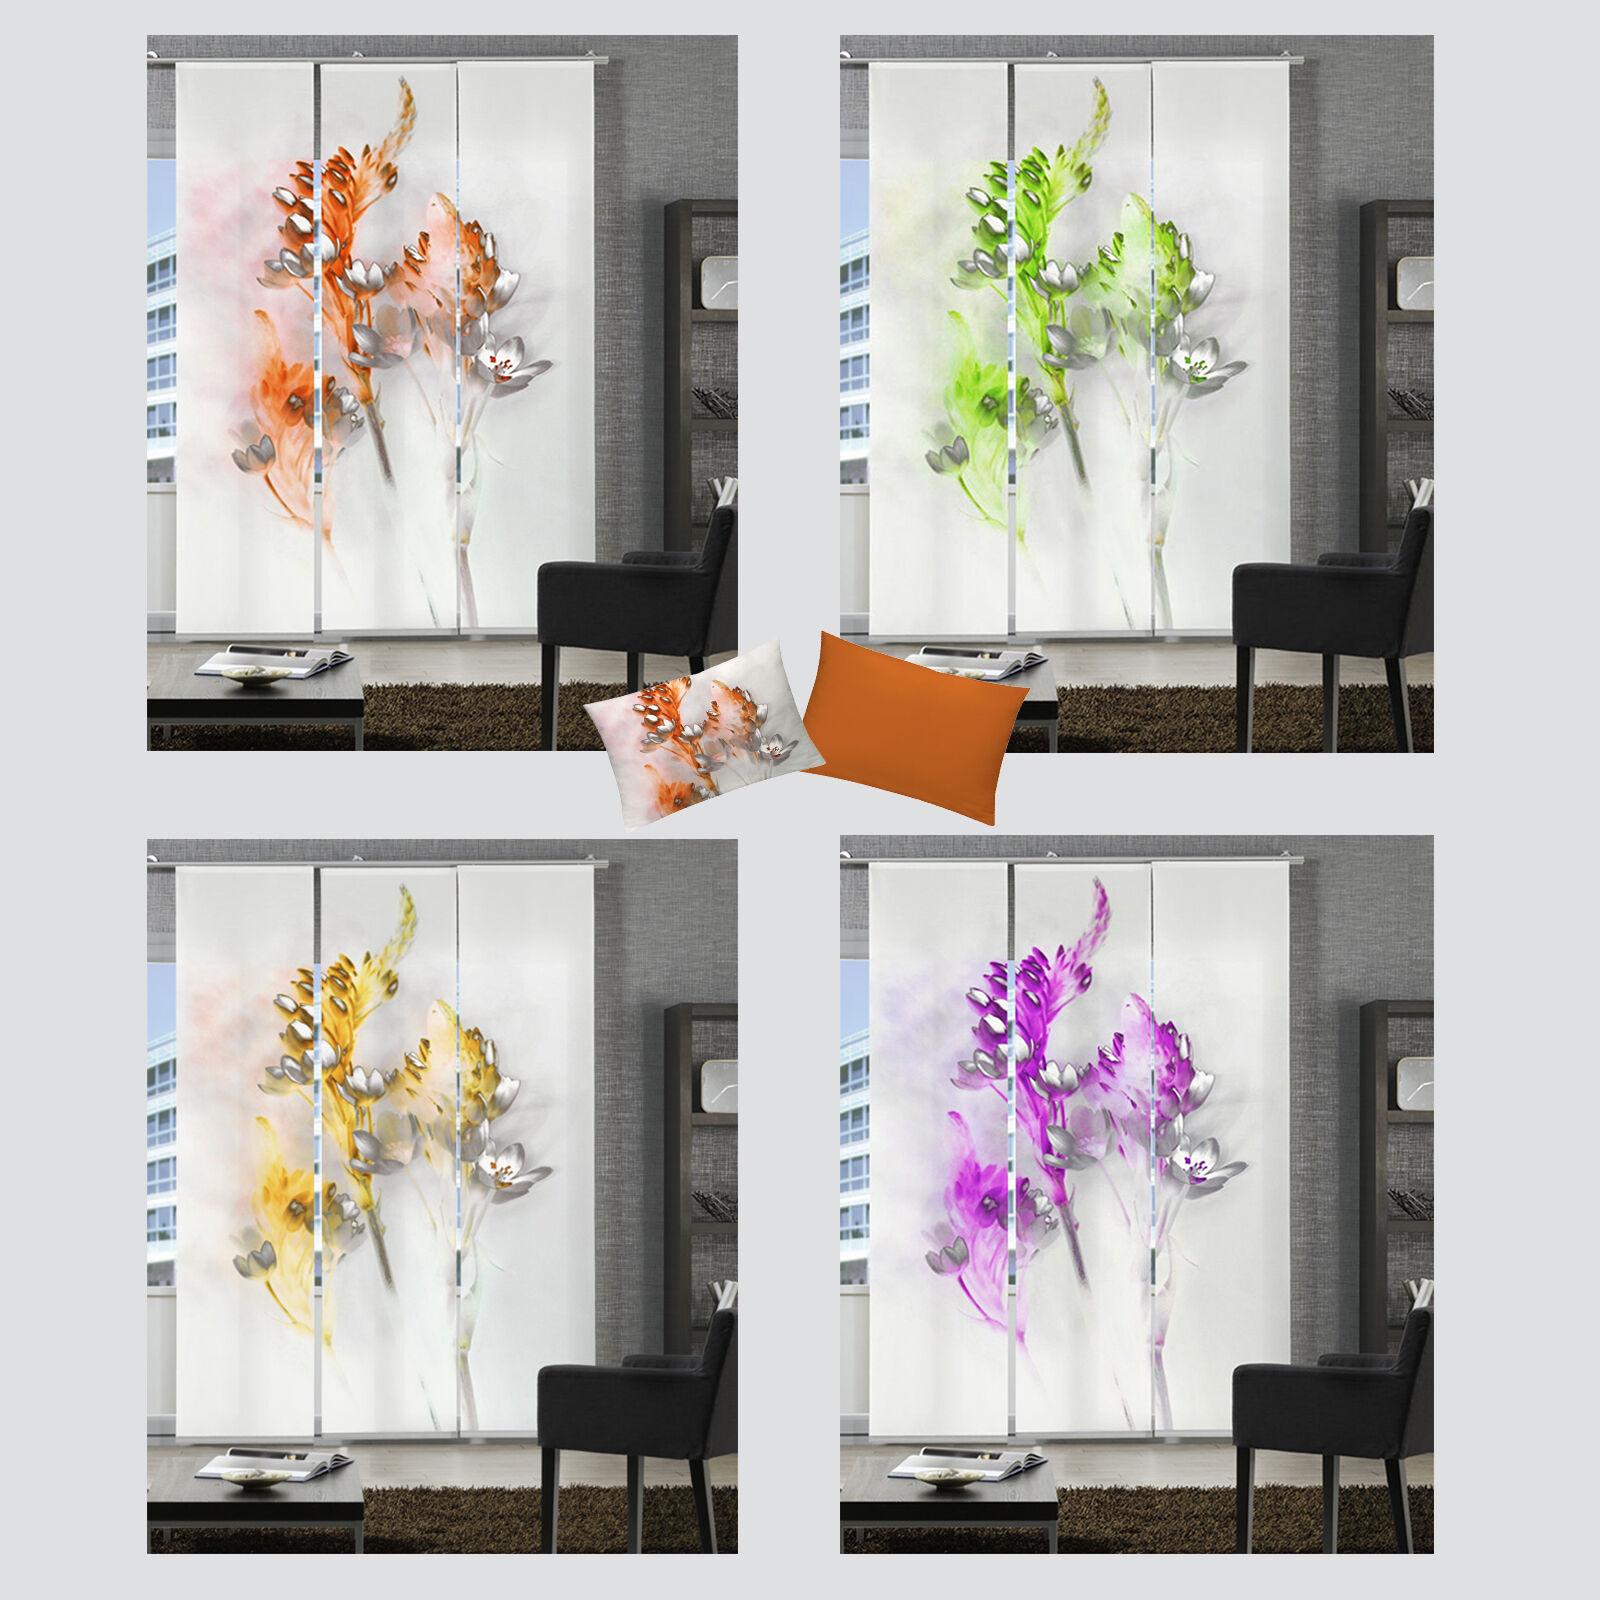 floralzauber blume aquarell schiebevorhang raumteiler. Black Bedroom Furniture Sets. Home Design Ideas